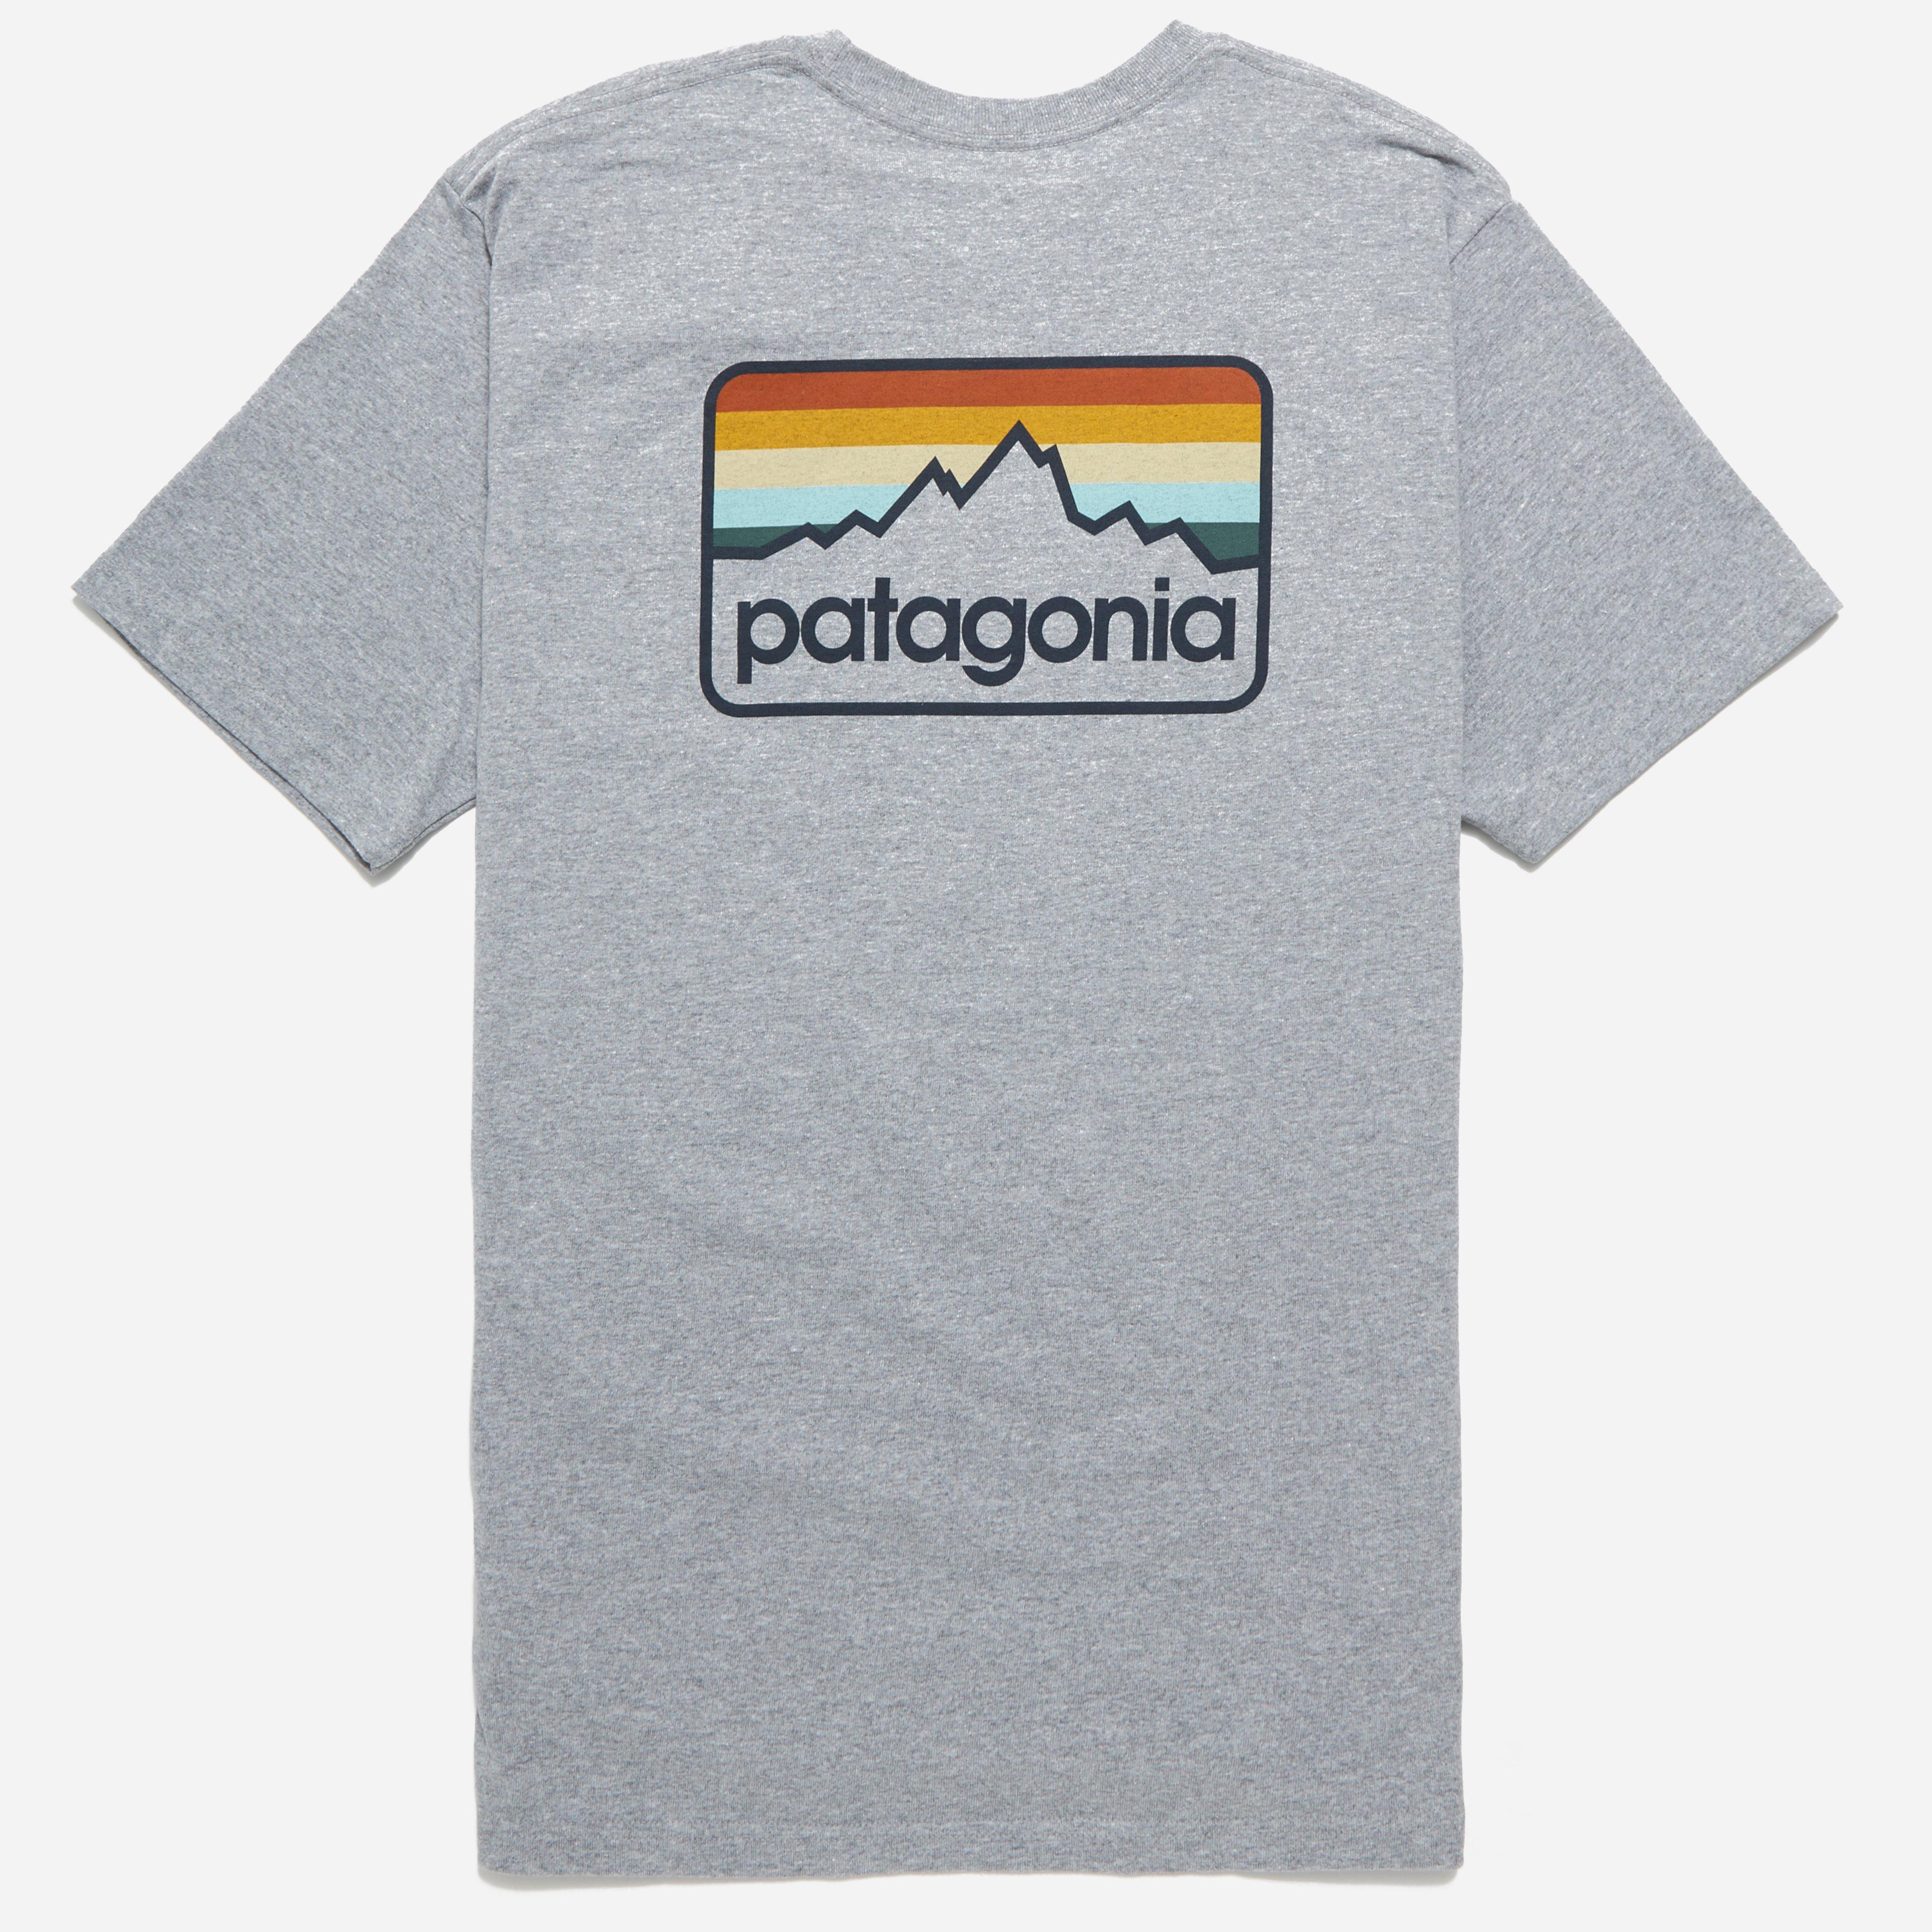 Patagonia Line Logo T-shirt